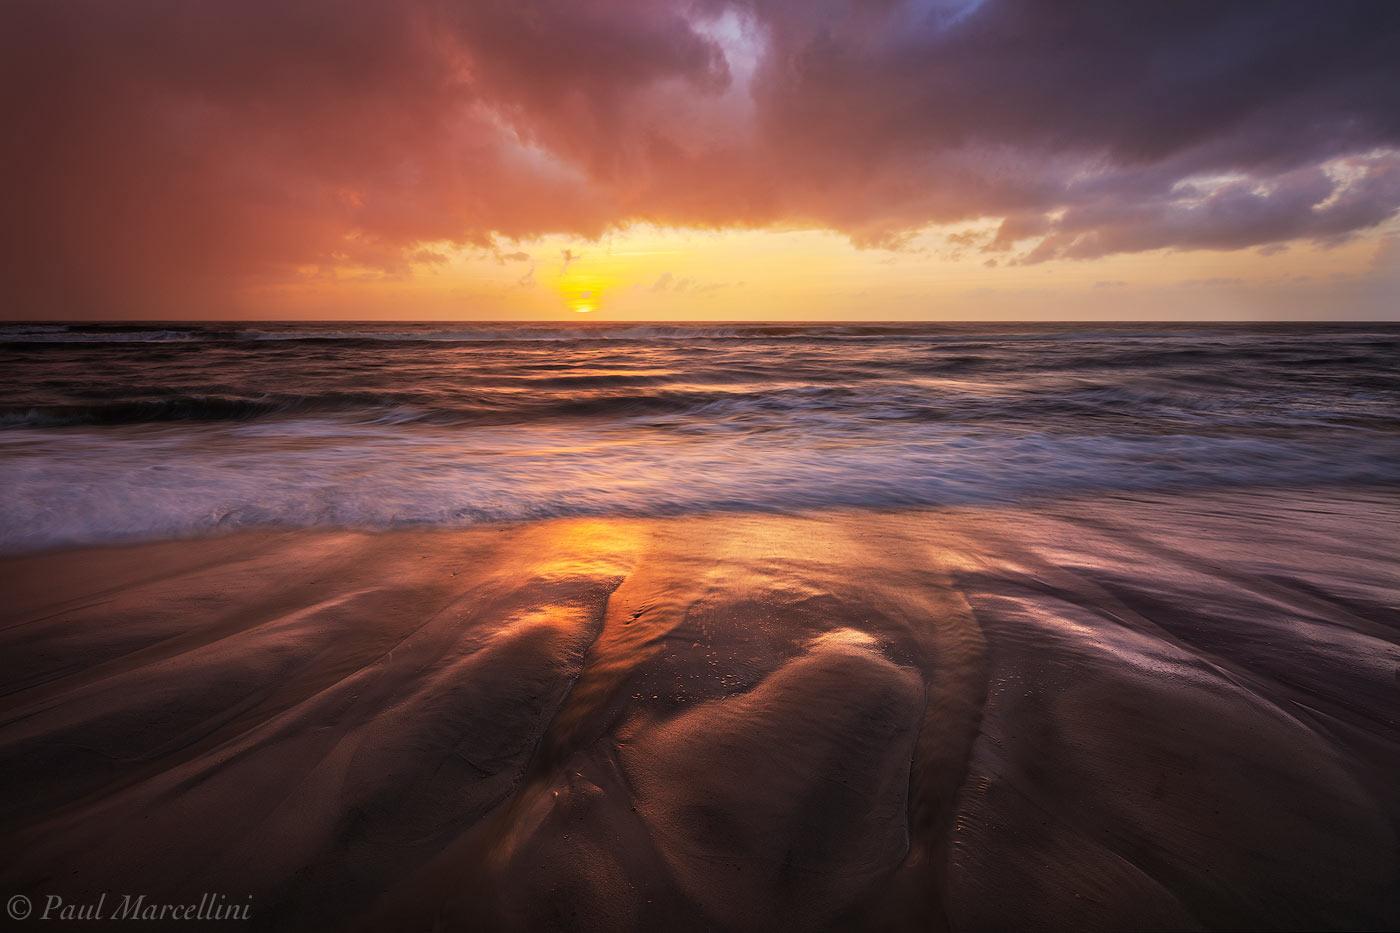 Cape San Blas, St. Joseph Peninsula State Park, Florida, stormy, beach, photo